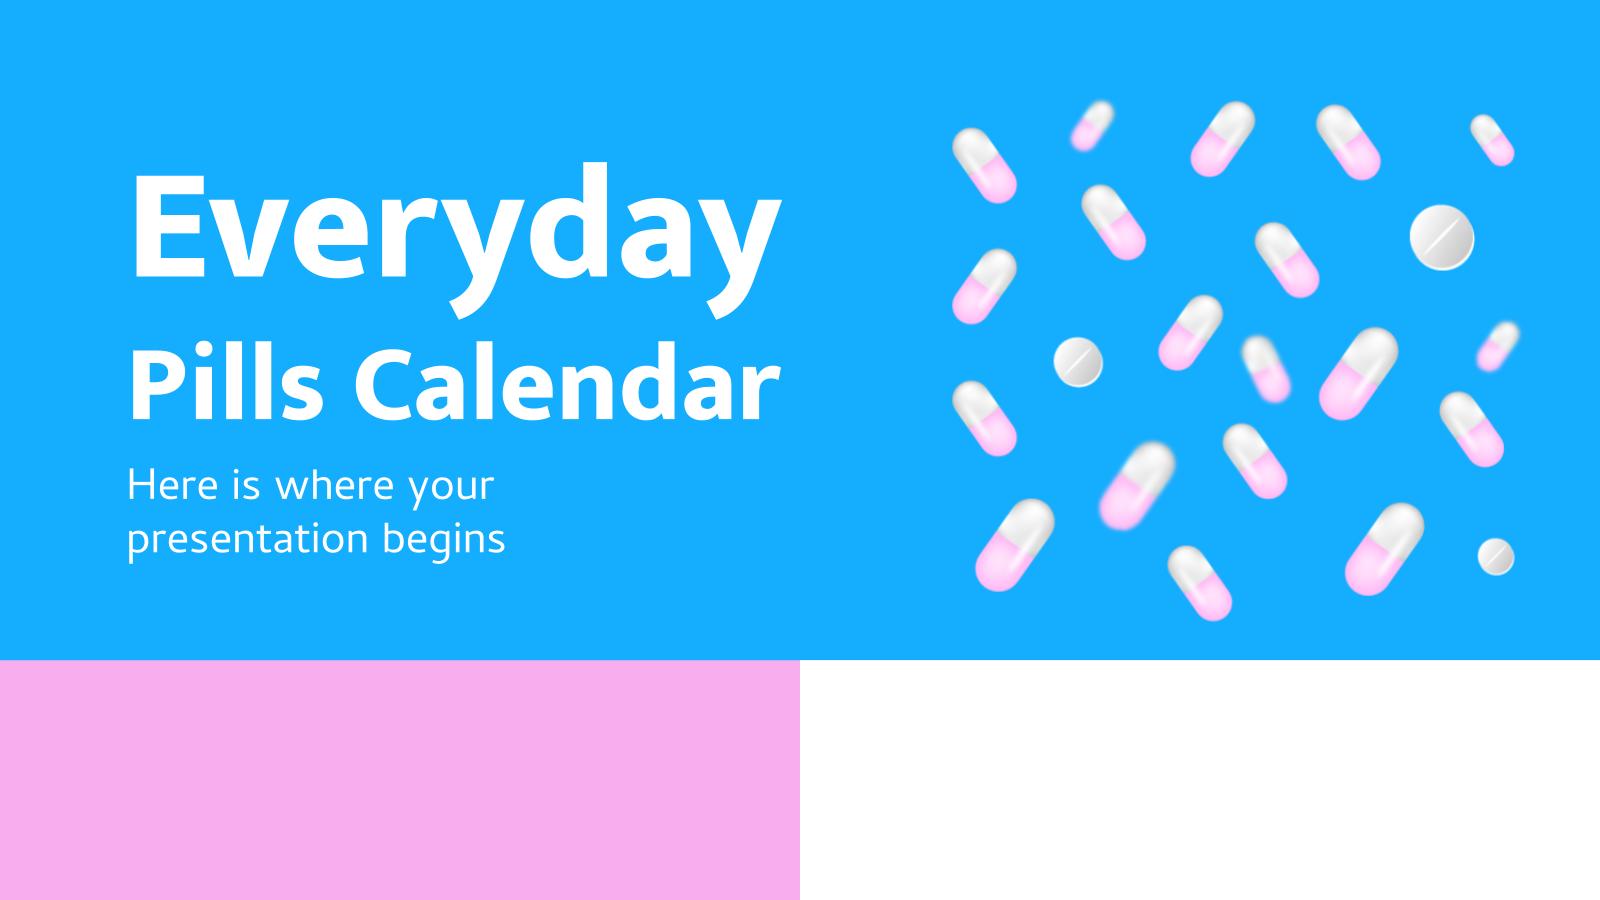 Everyday Pills Calendar presentation template